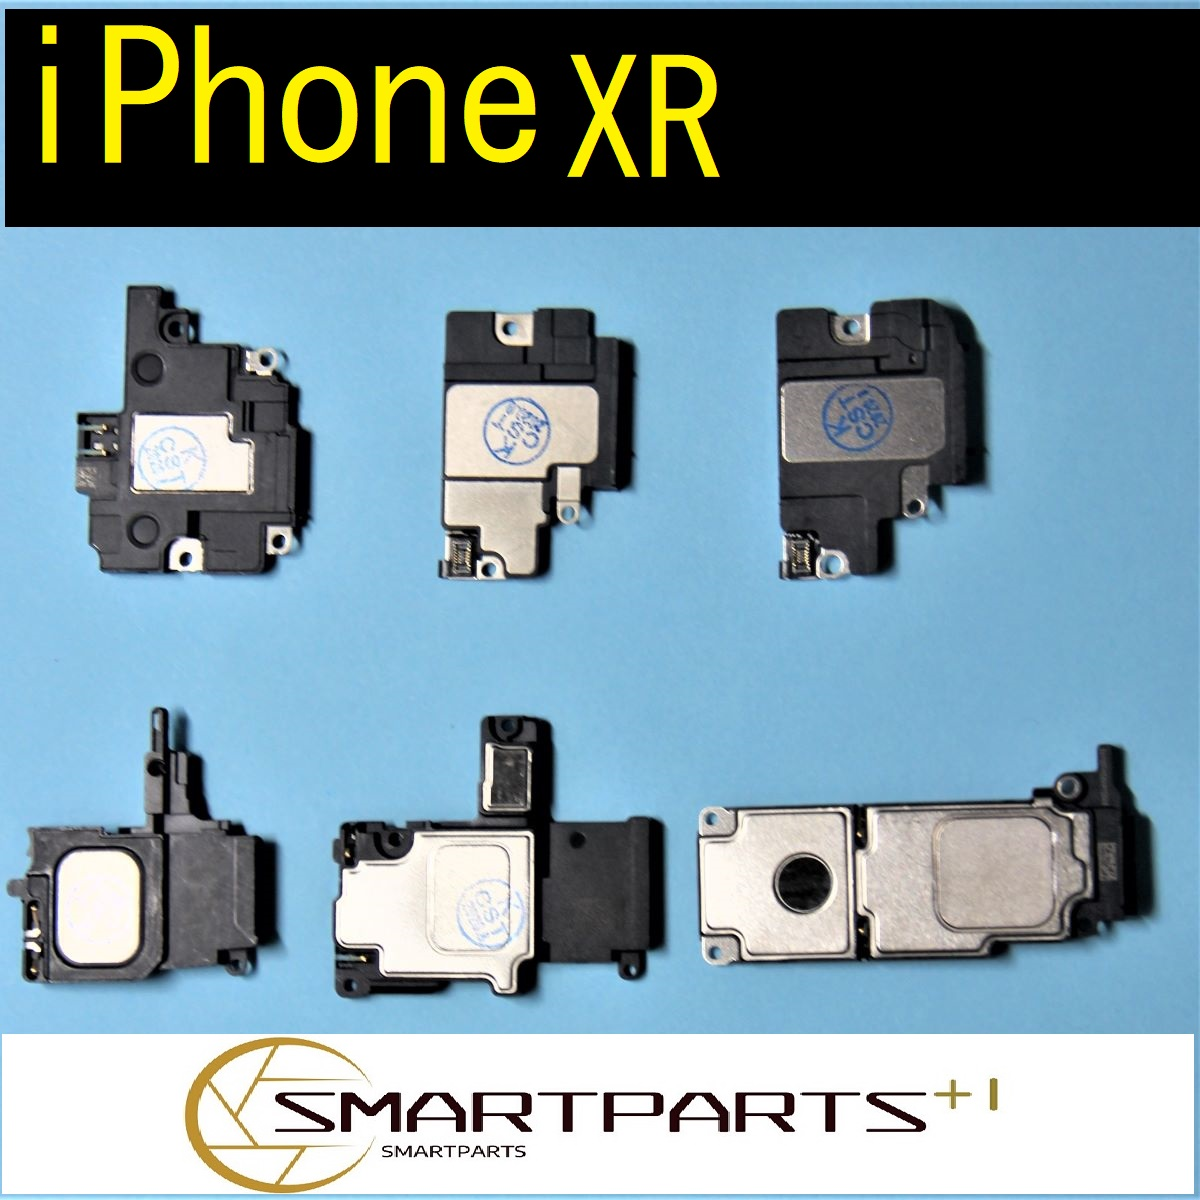 iPhoneXRラウドスピーカー 修理工具セット付き ハイクオリティ お買得 下部スピーカー 修理交換パーツ DIY修理 リペア部品 アイフォン